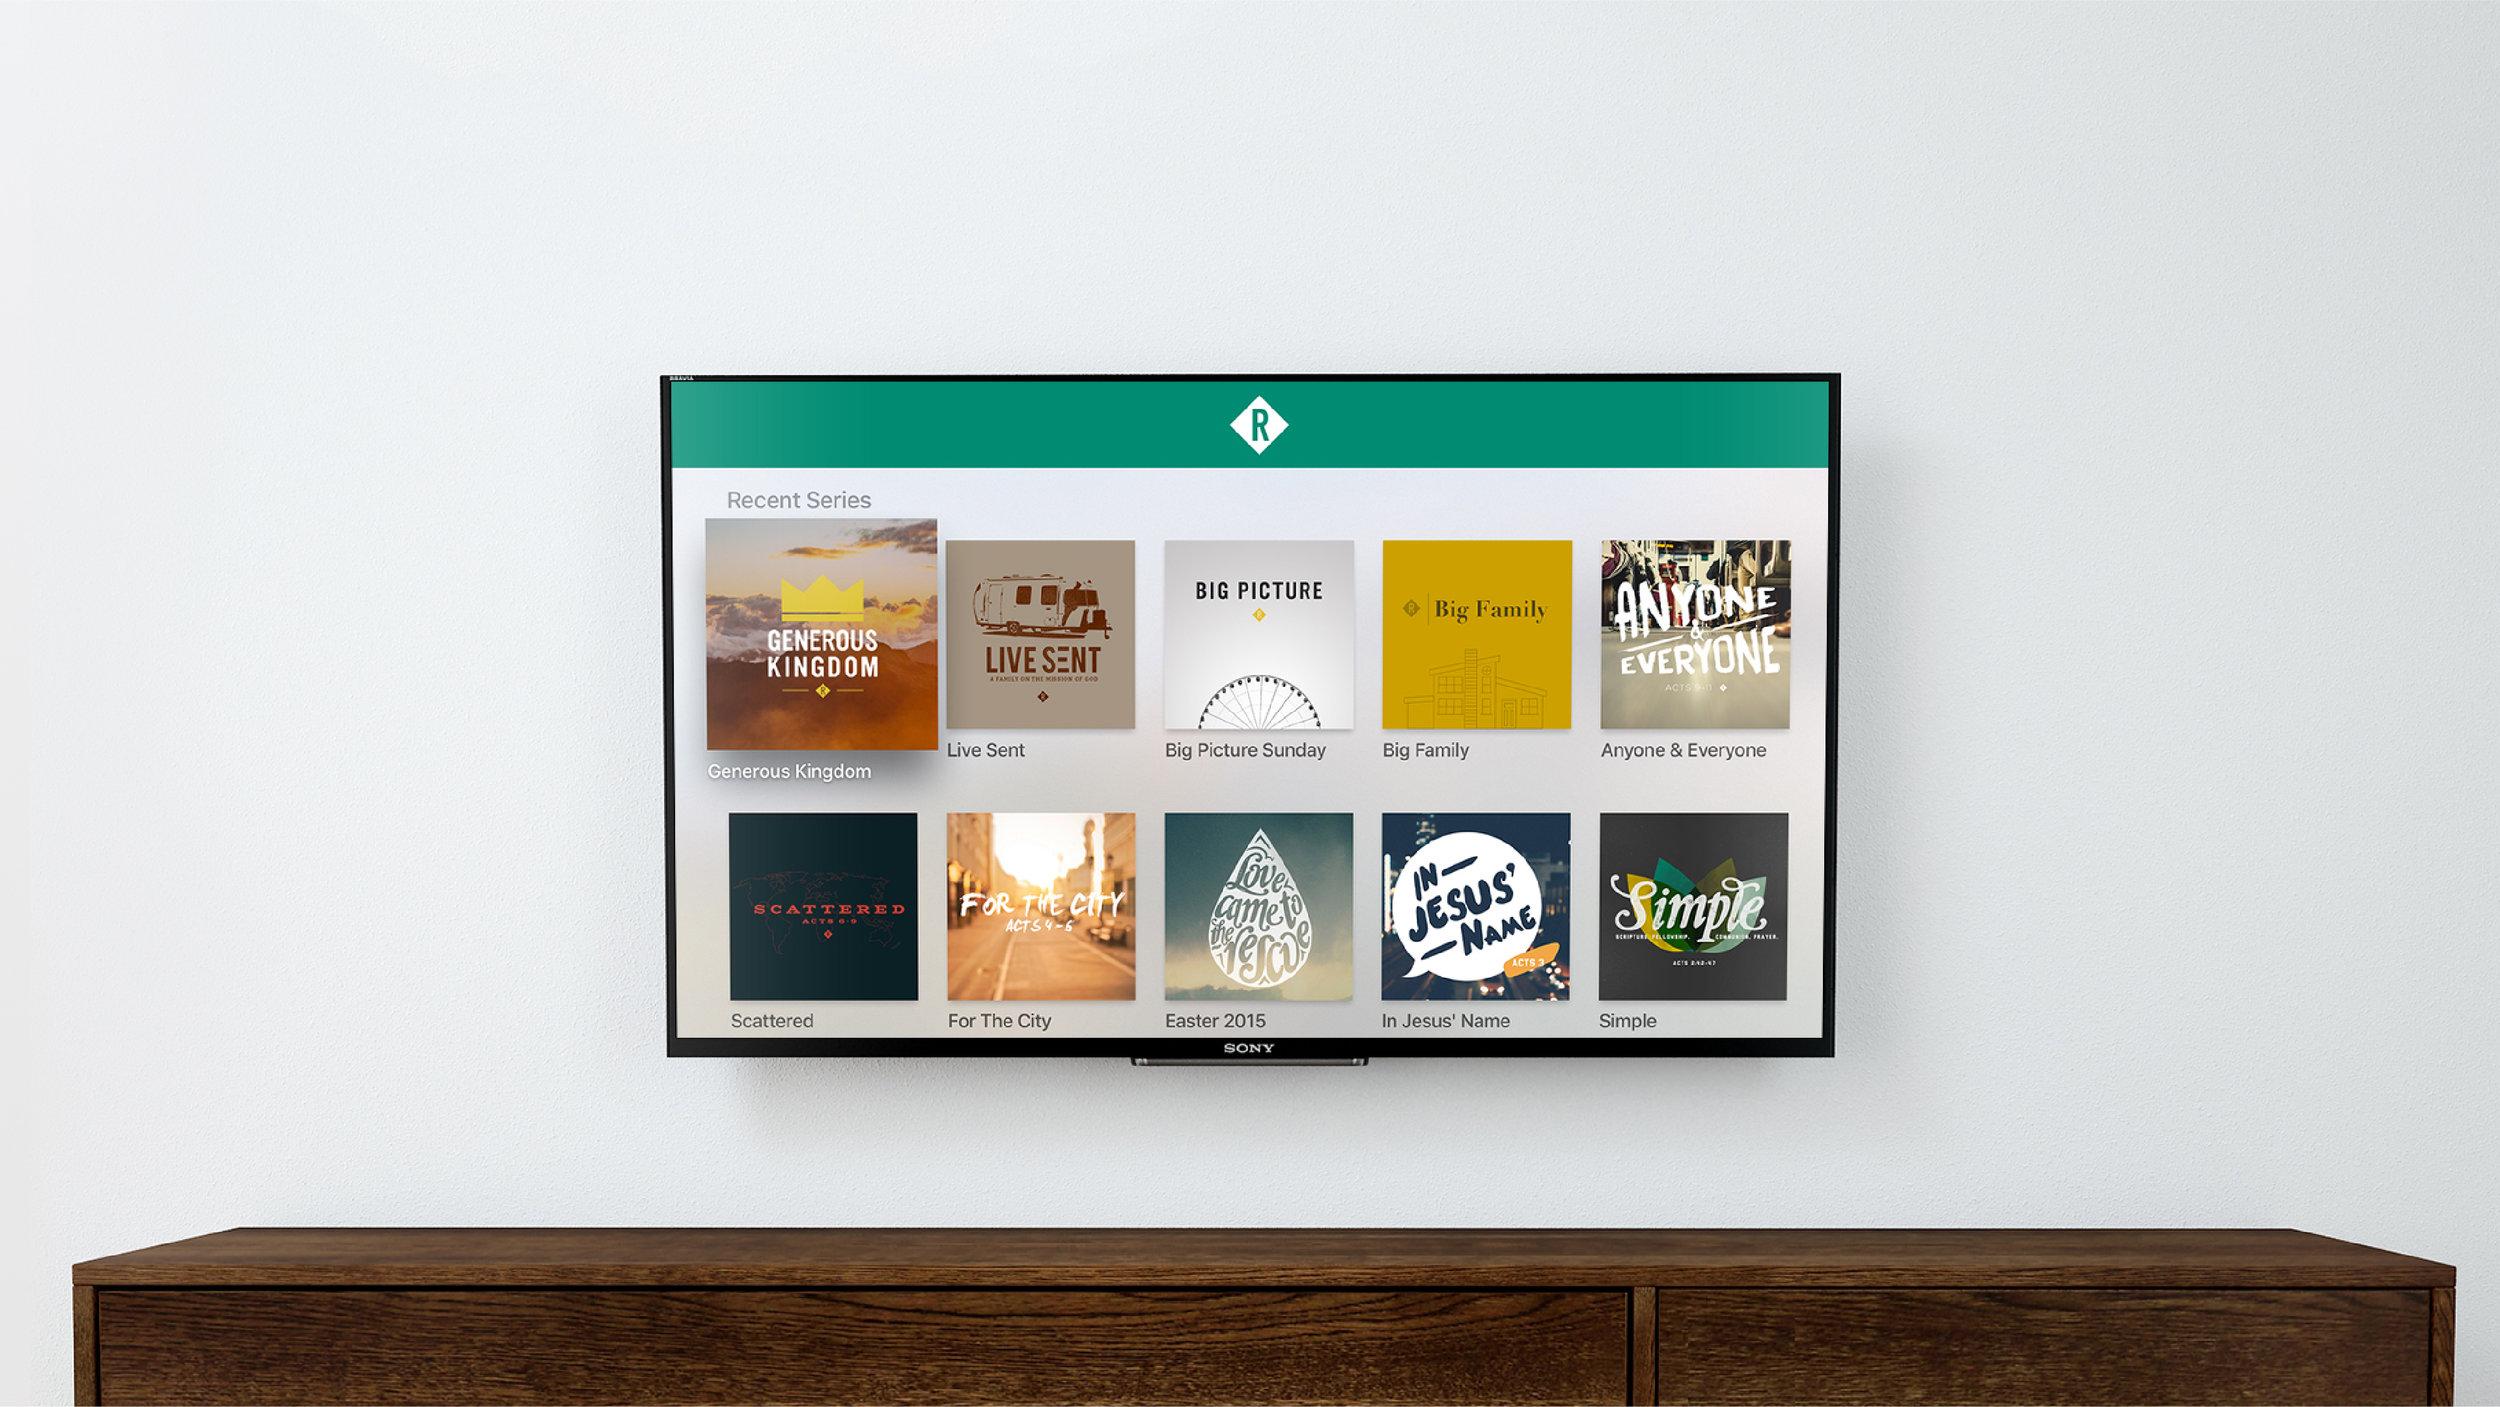 TV@2x-100.jpg